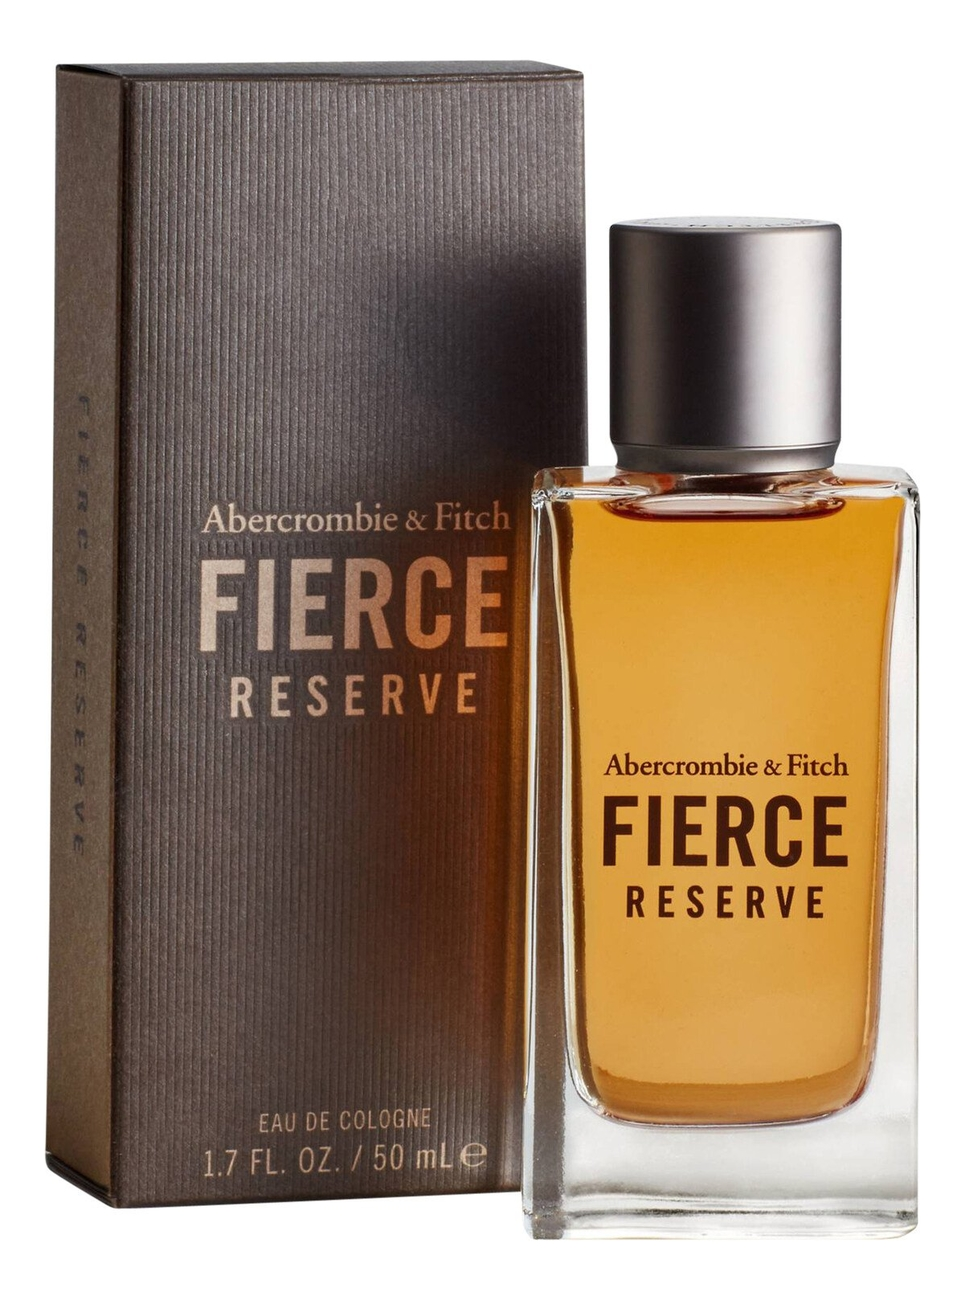 Abercrombie & Fitch Fierce Reserve: одеколон 50мл